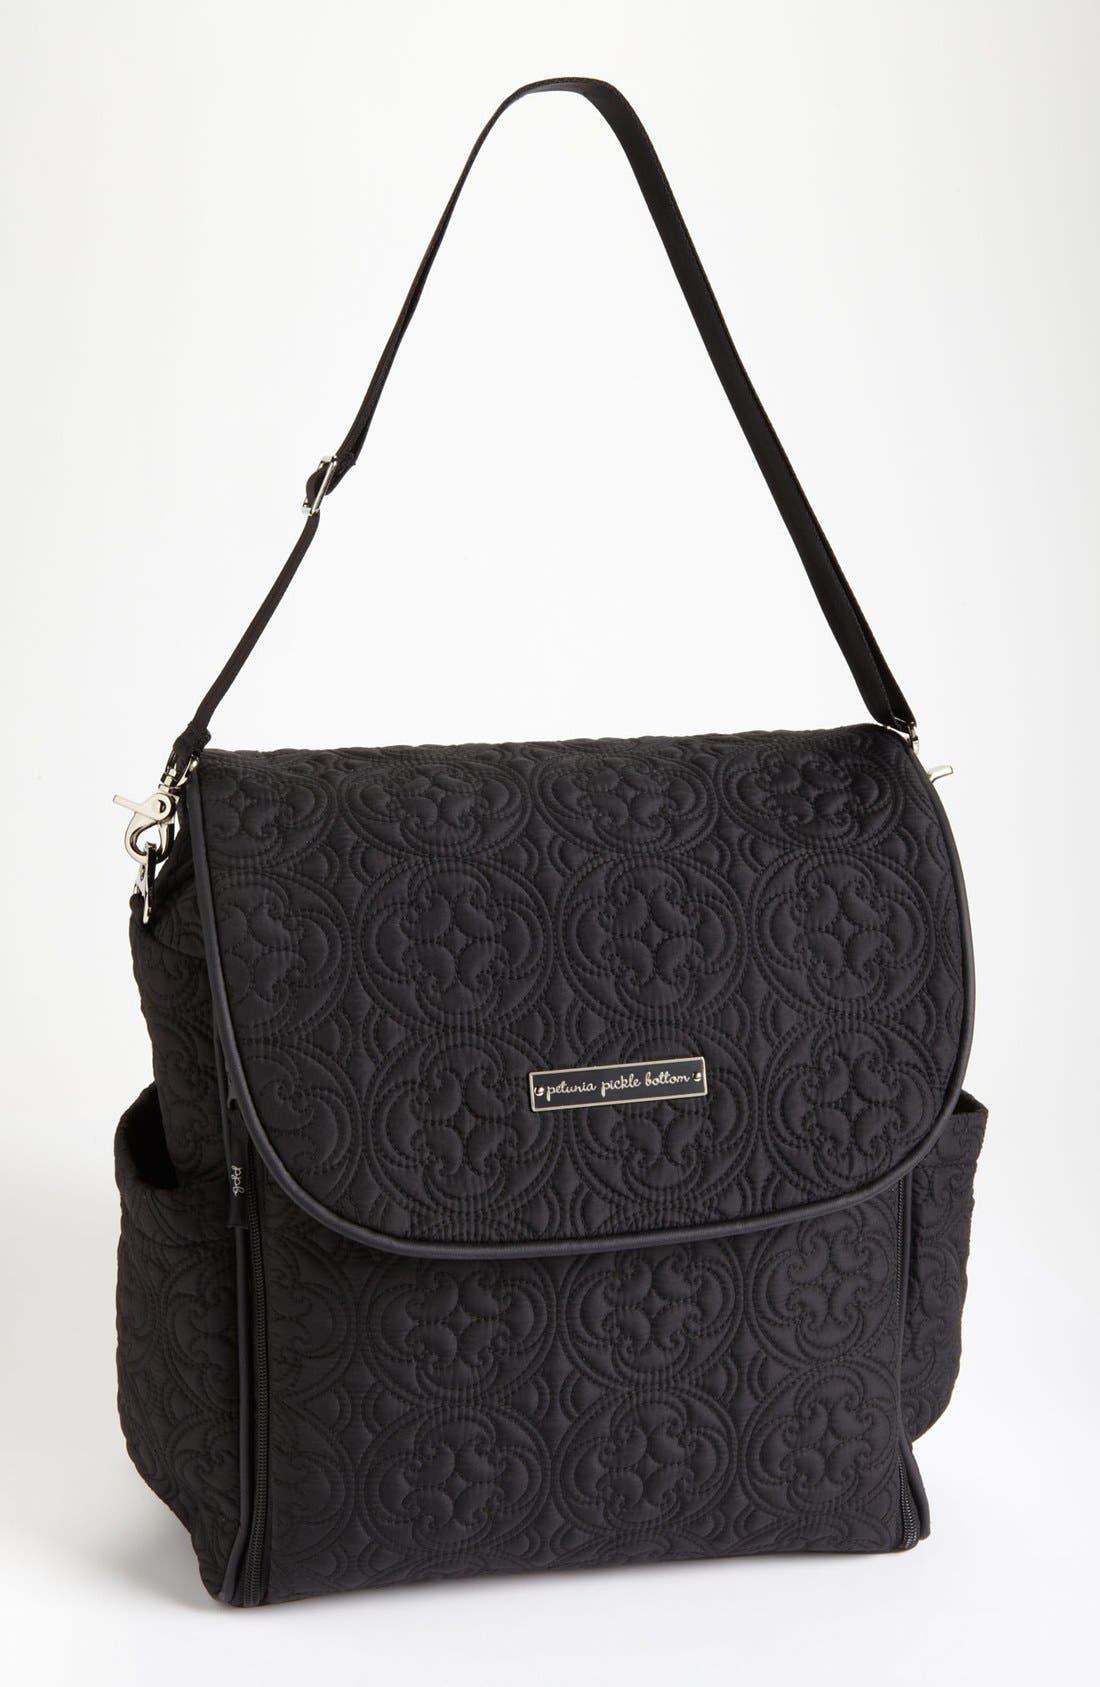 Alternate Image 1 Selected - Petunia Pickle Bottom 'Embossed Boxy' Backpack Diaper Bag